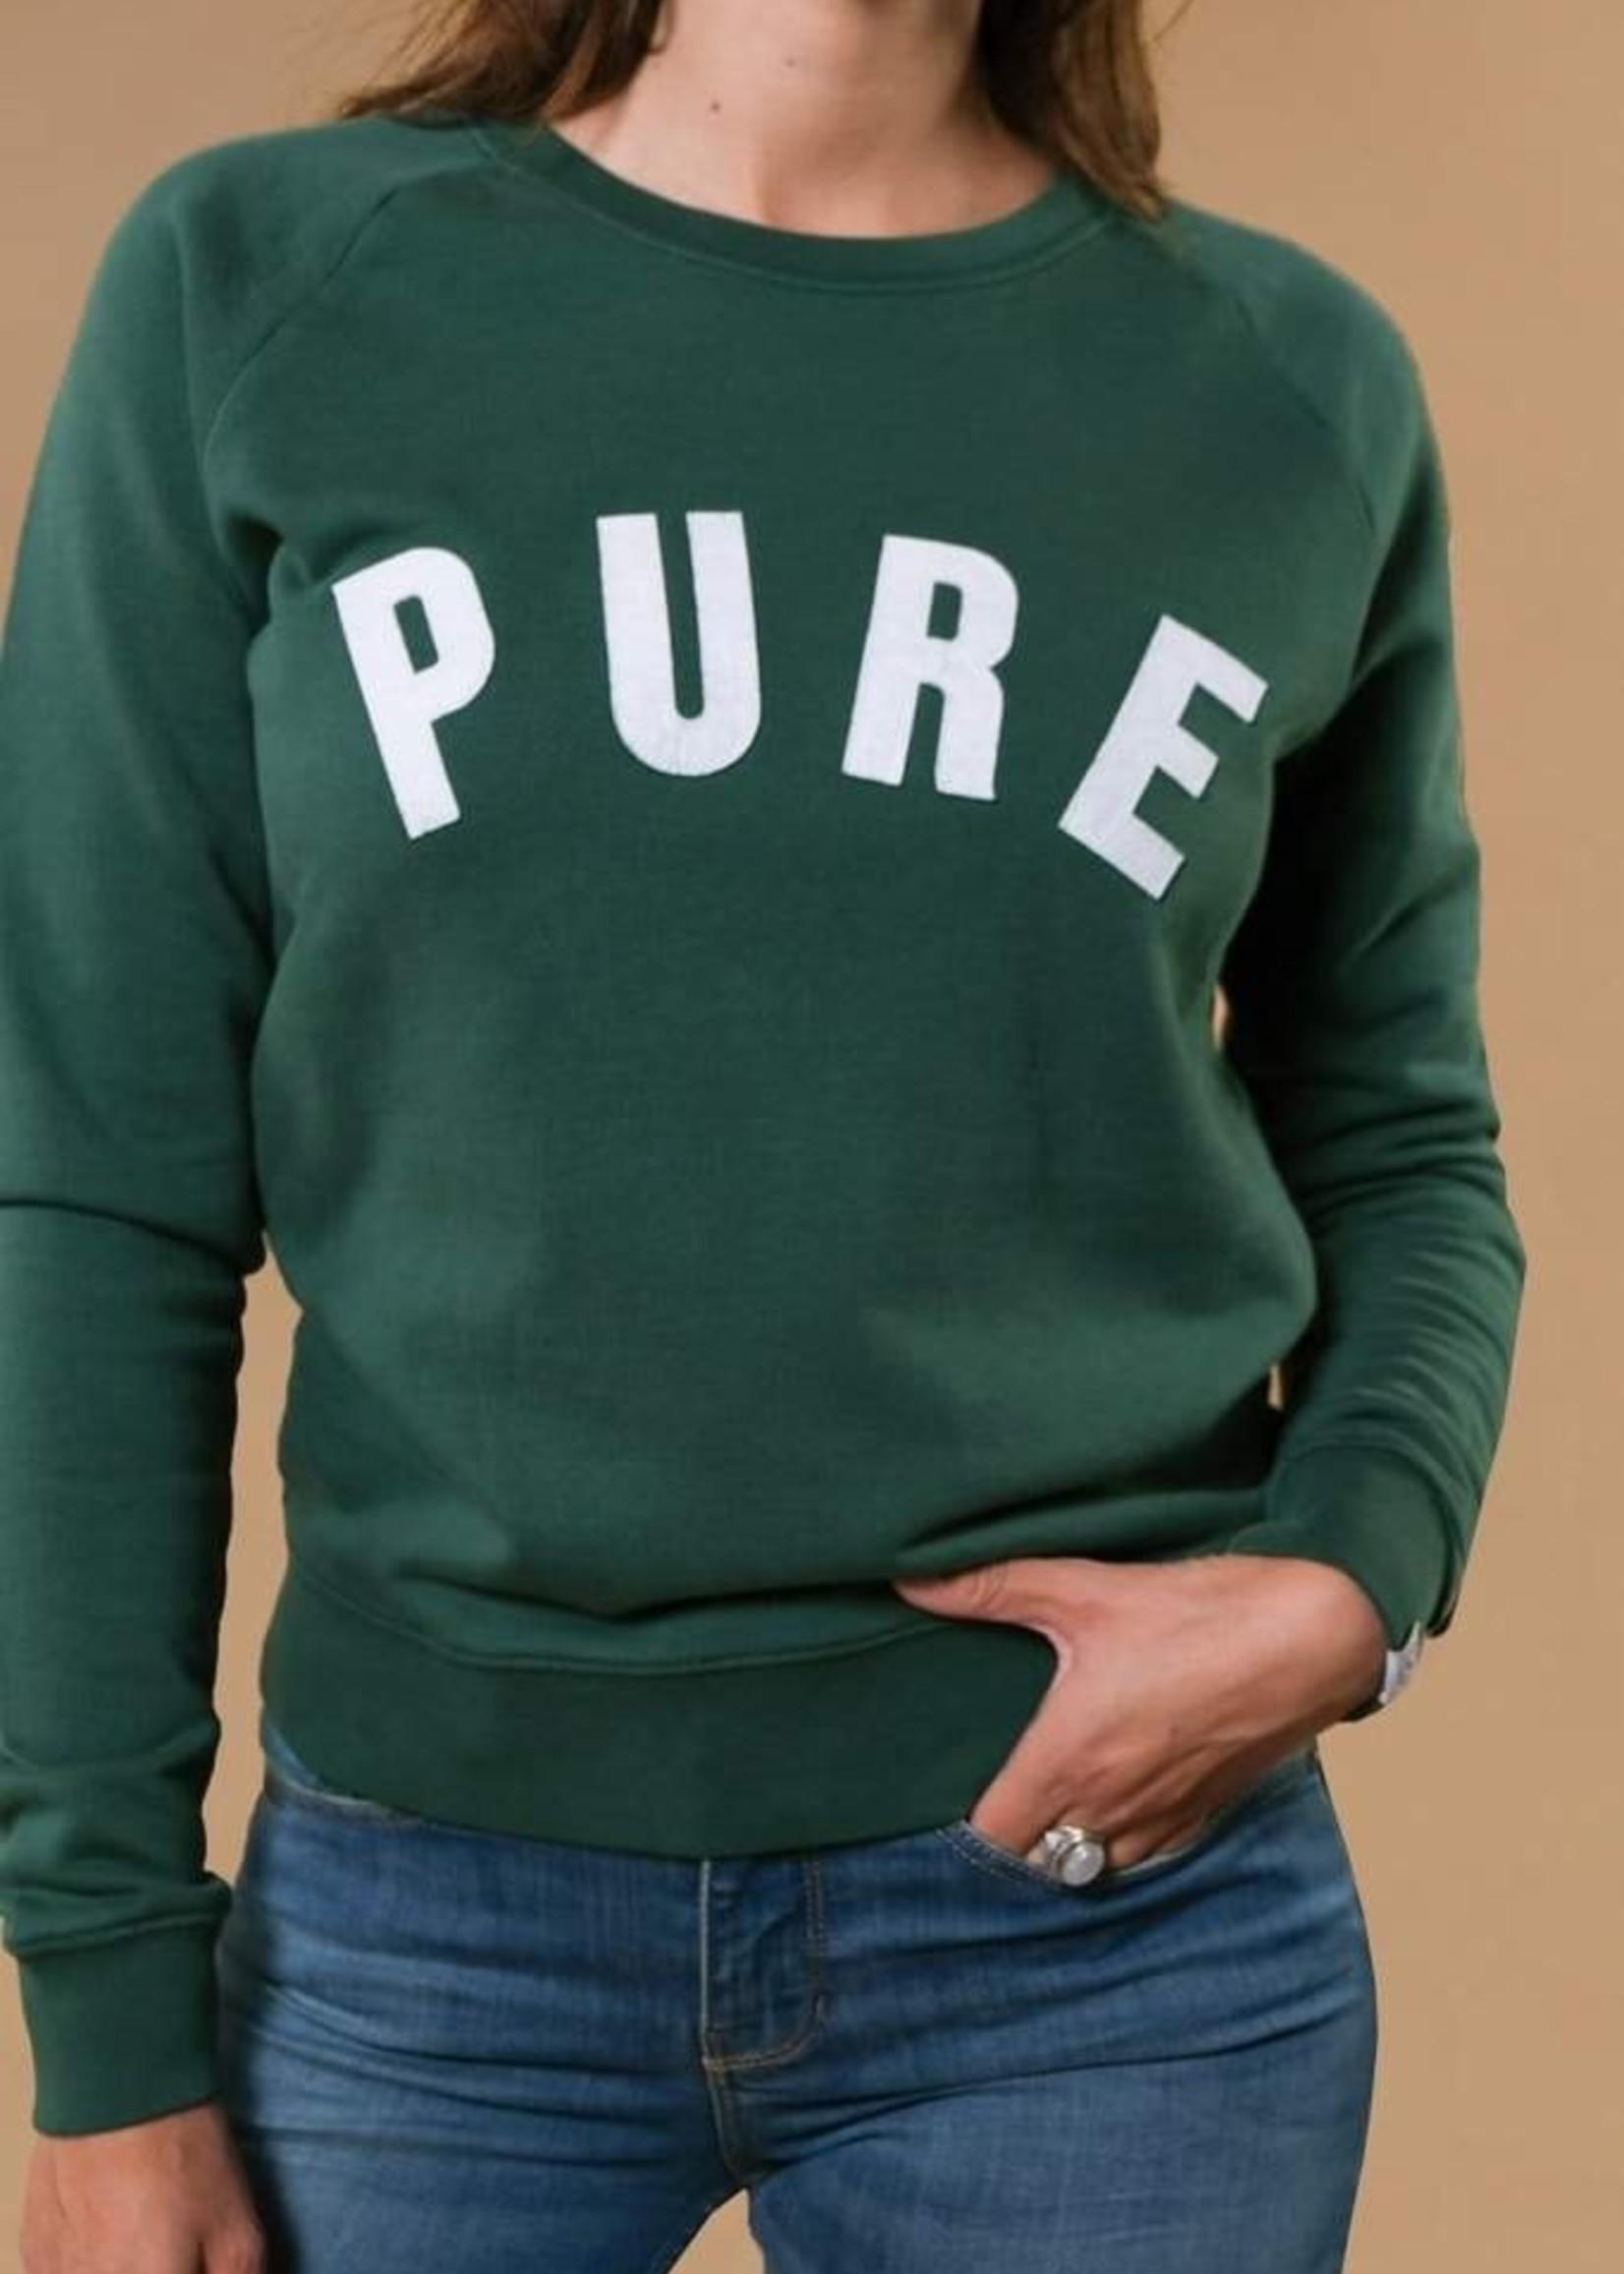 Kuyichi Ruby Sweater